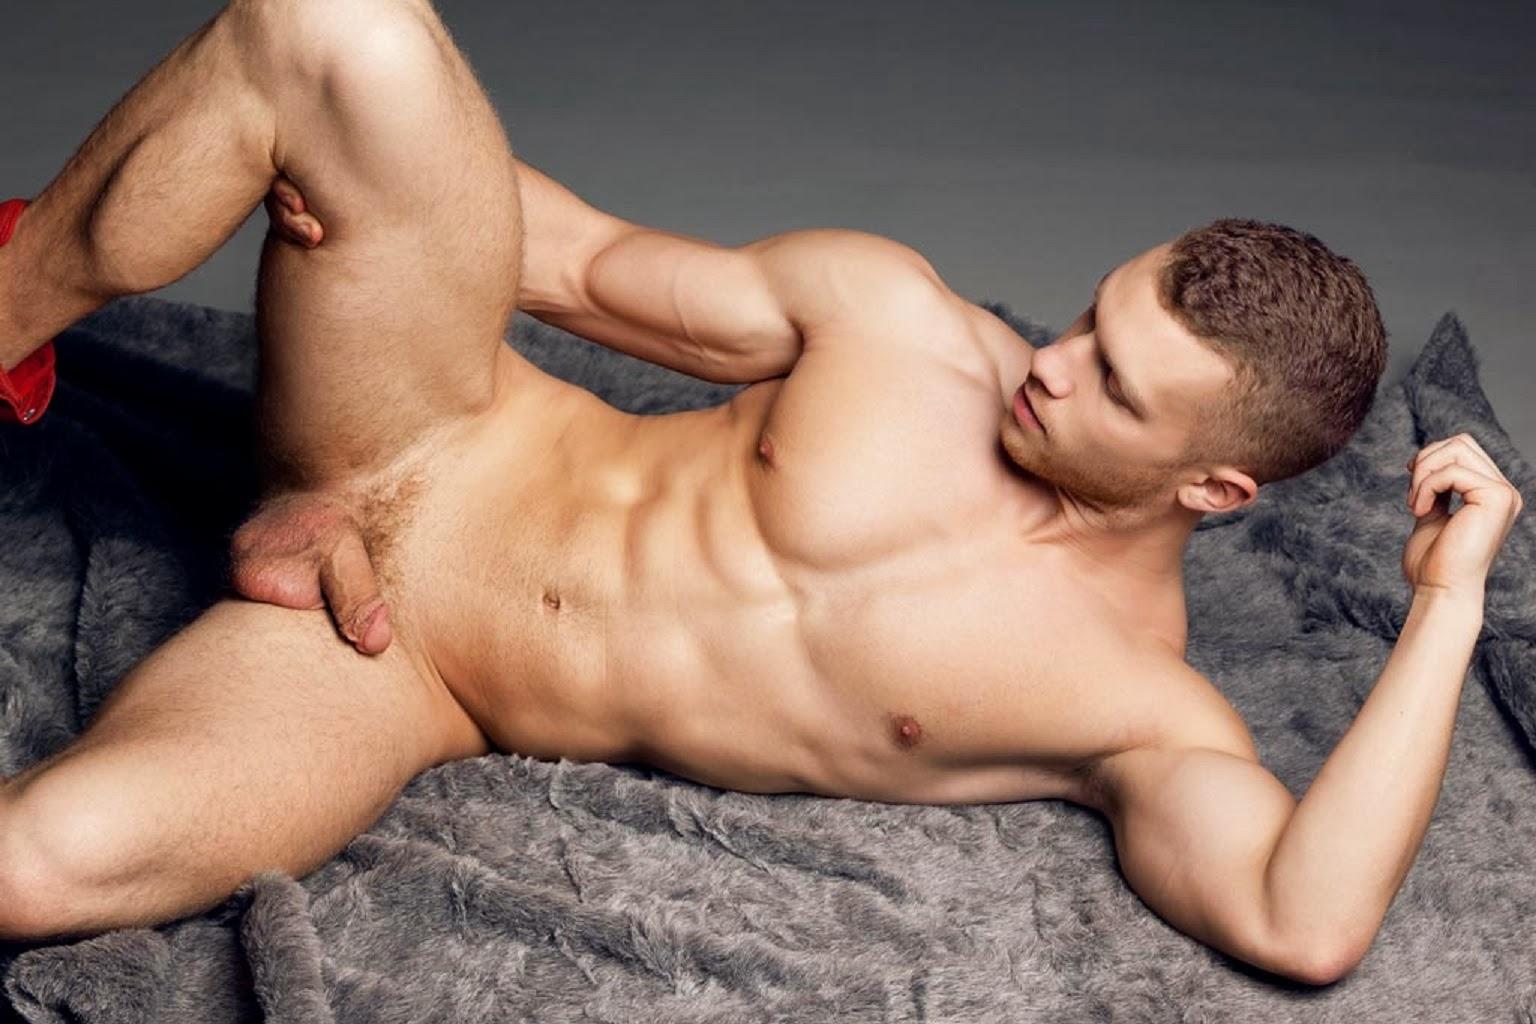 Обнаженный Юноша Порно